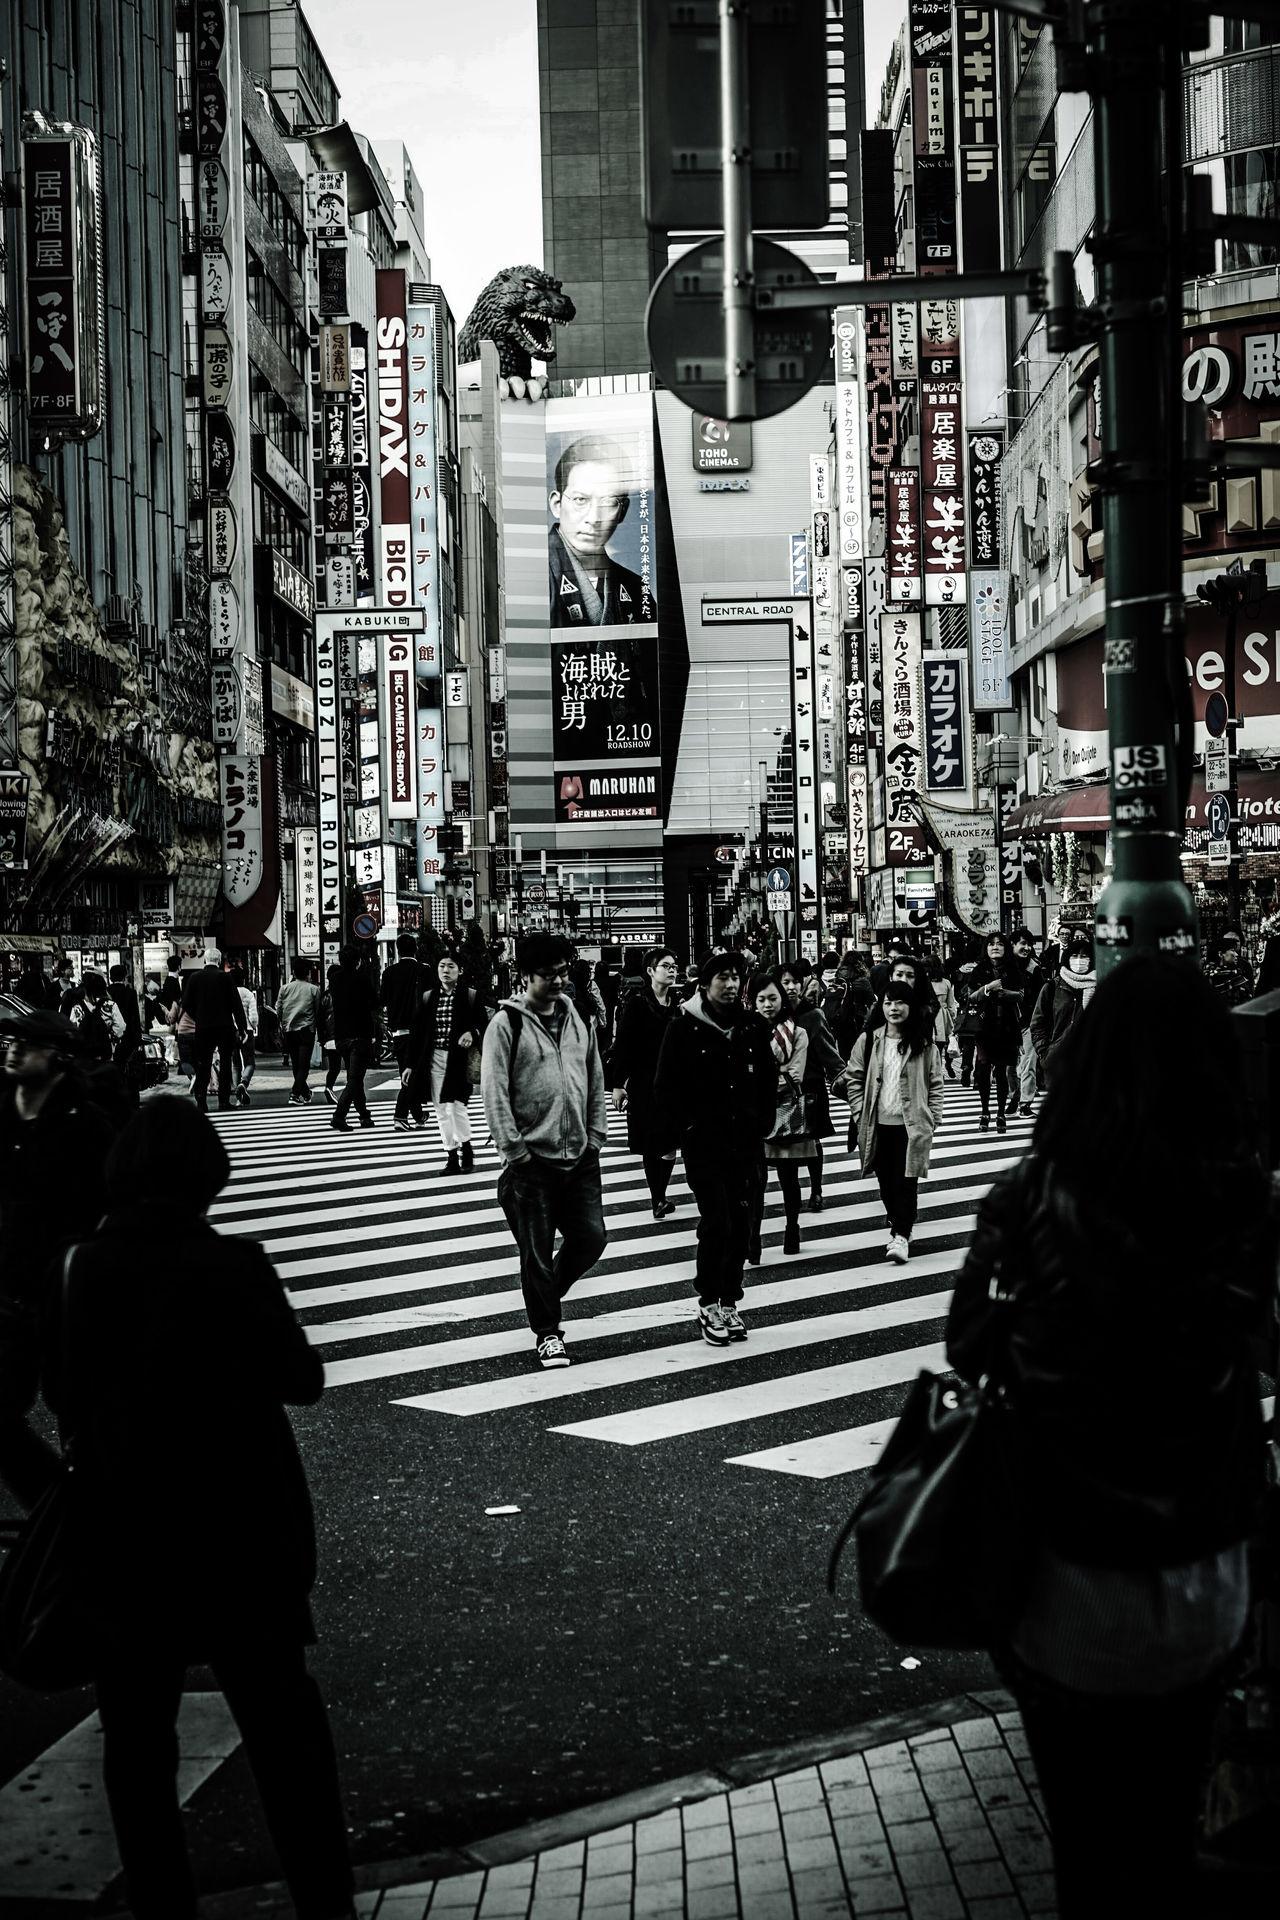 City City Life Street City Street Snapshots Of Life Streetphotography Tokyo,Japan SHINJYUKU Godzilla